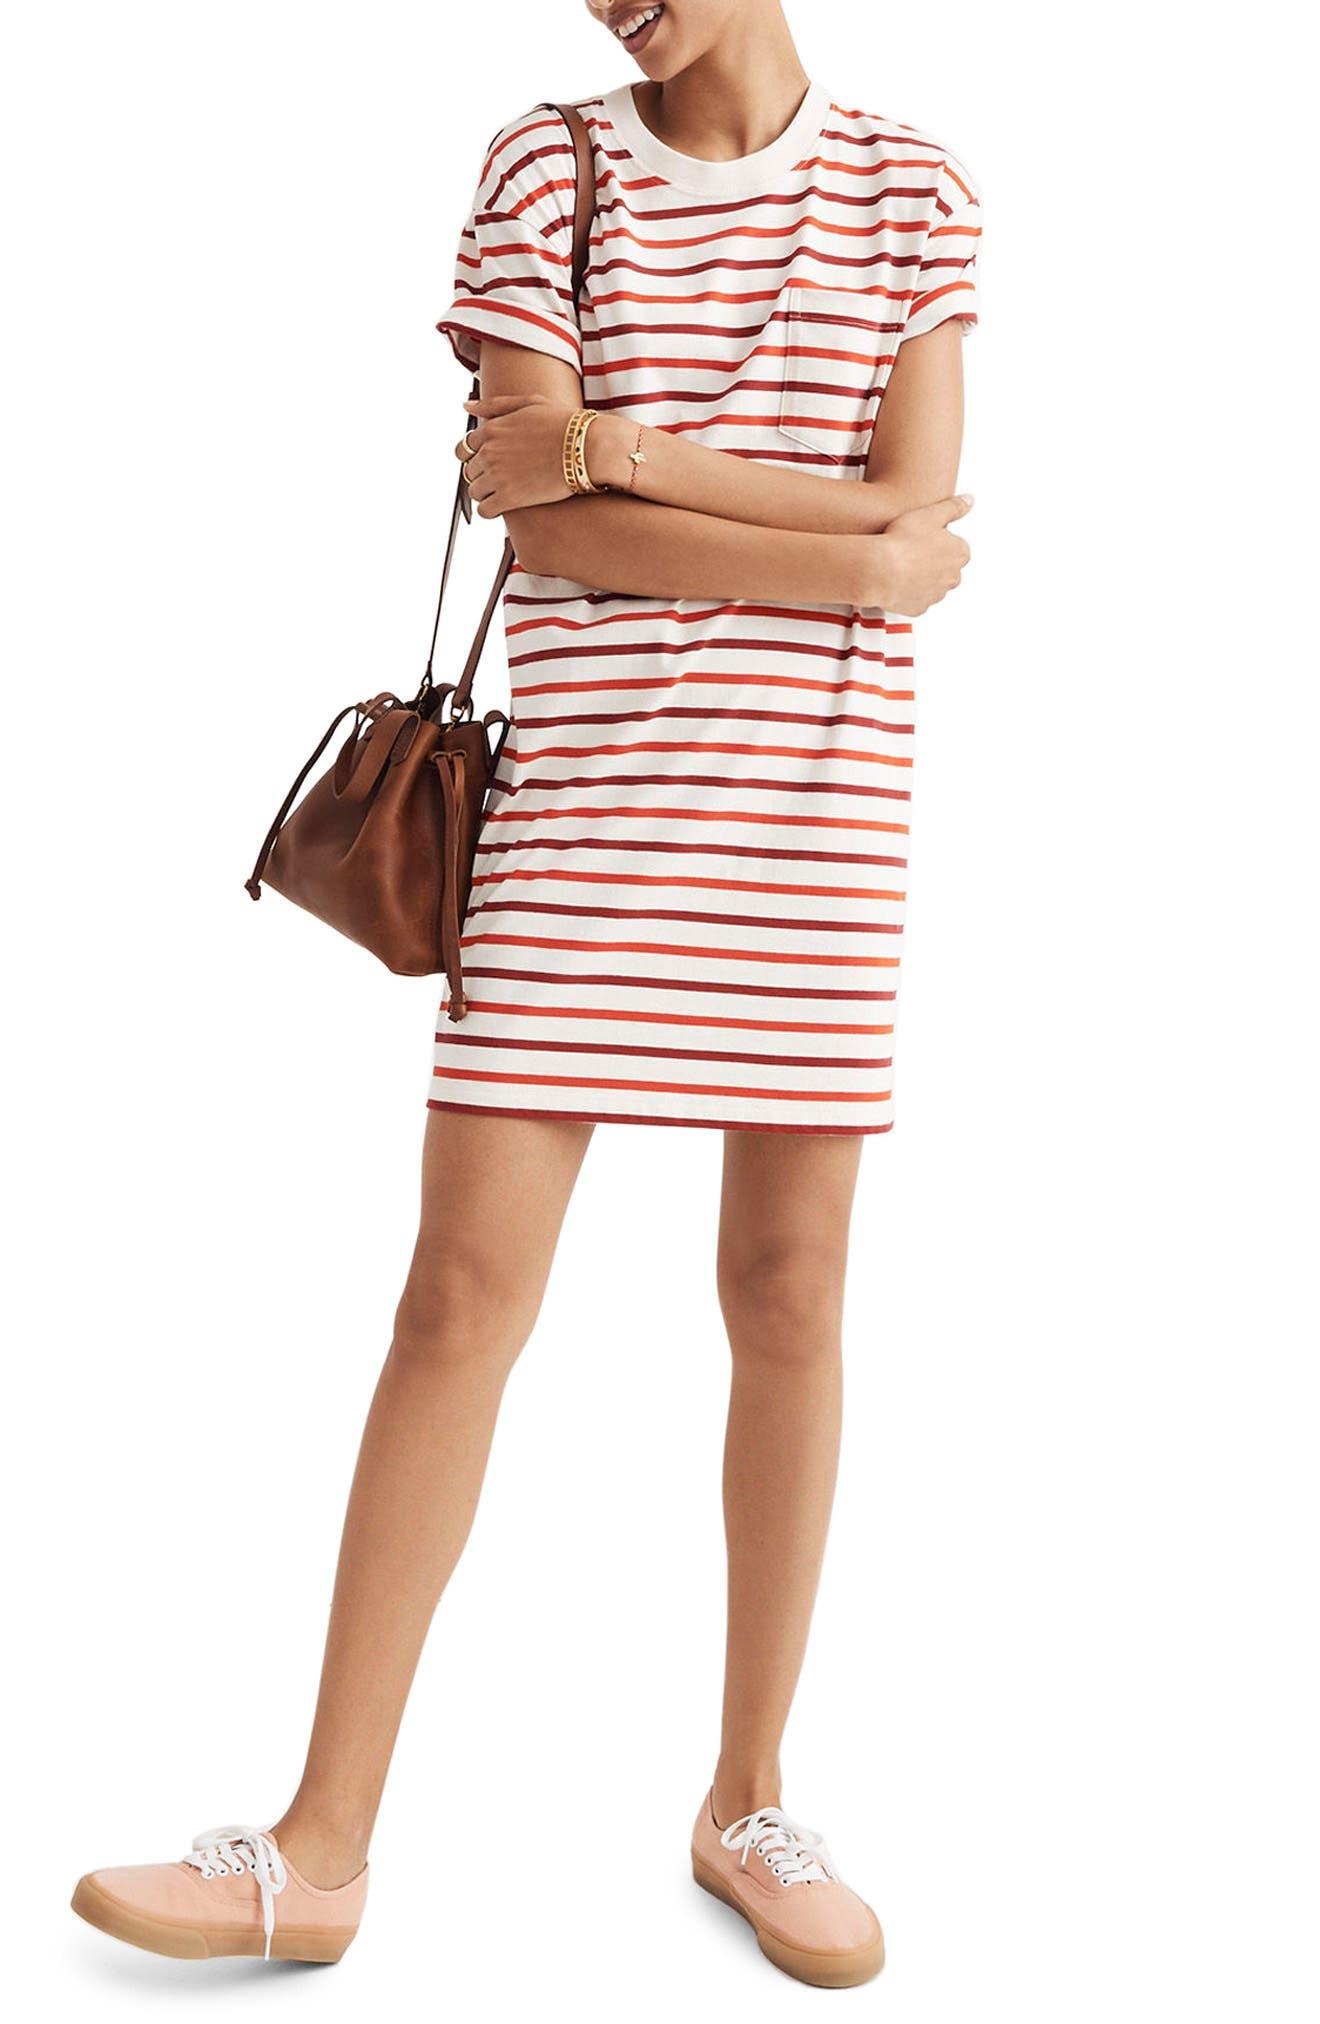 Madewell Stripe Pocket T-shirt Dress